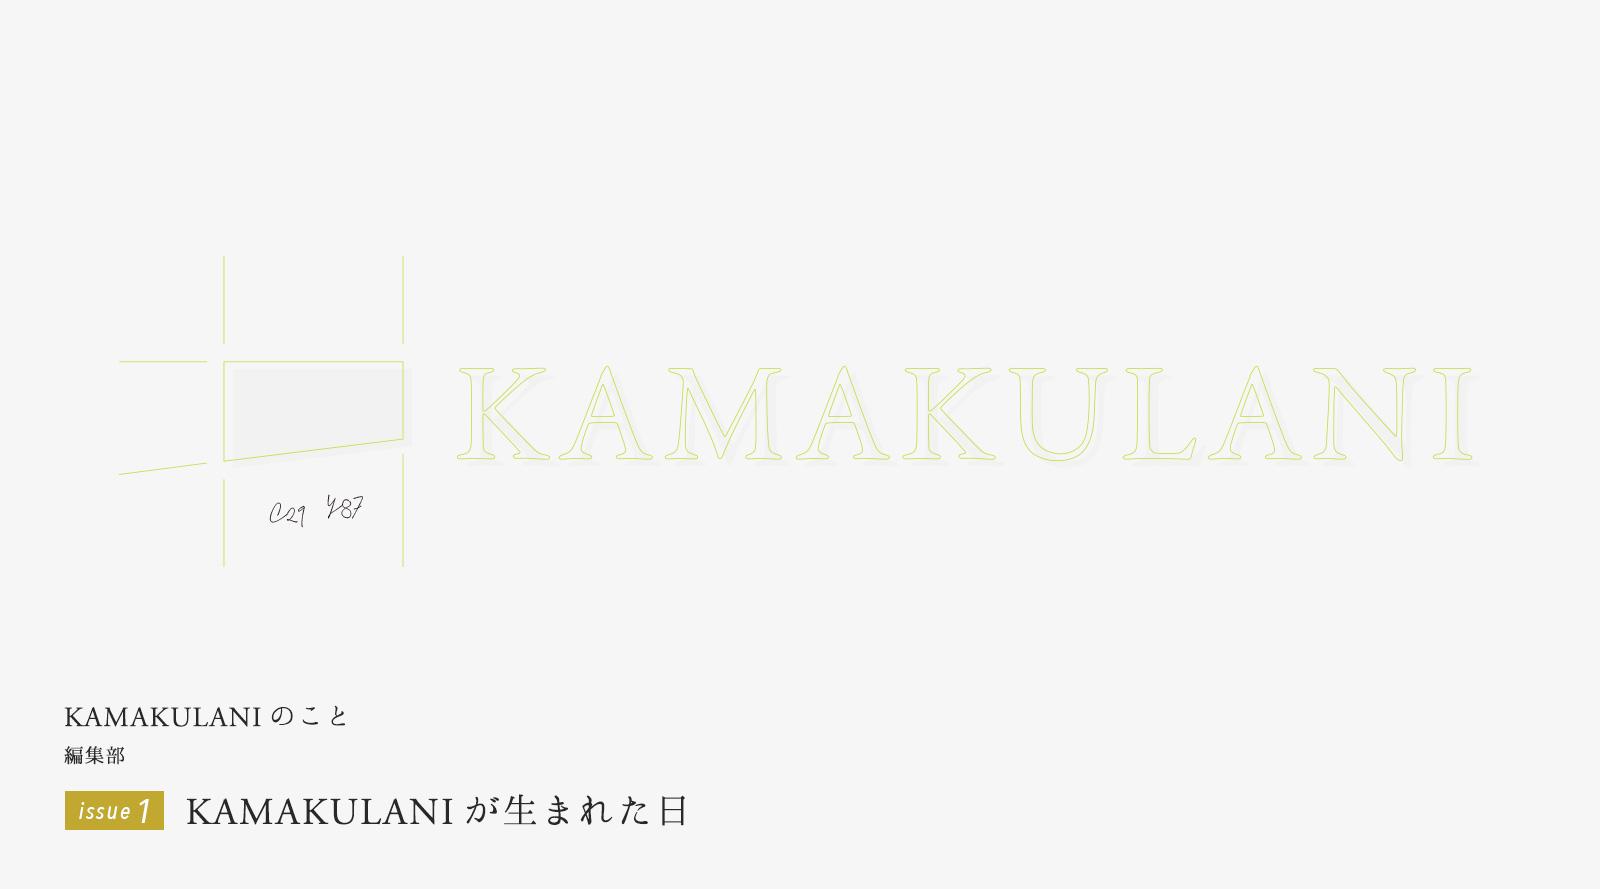 KAMAKULANIが生まれた日